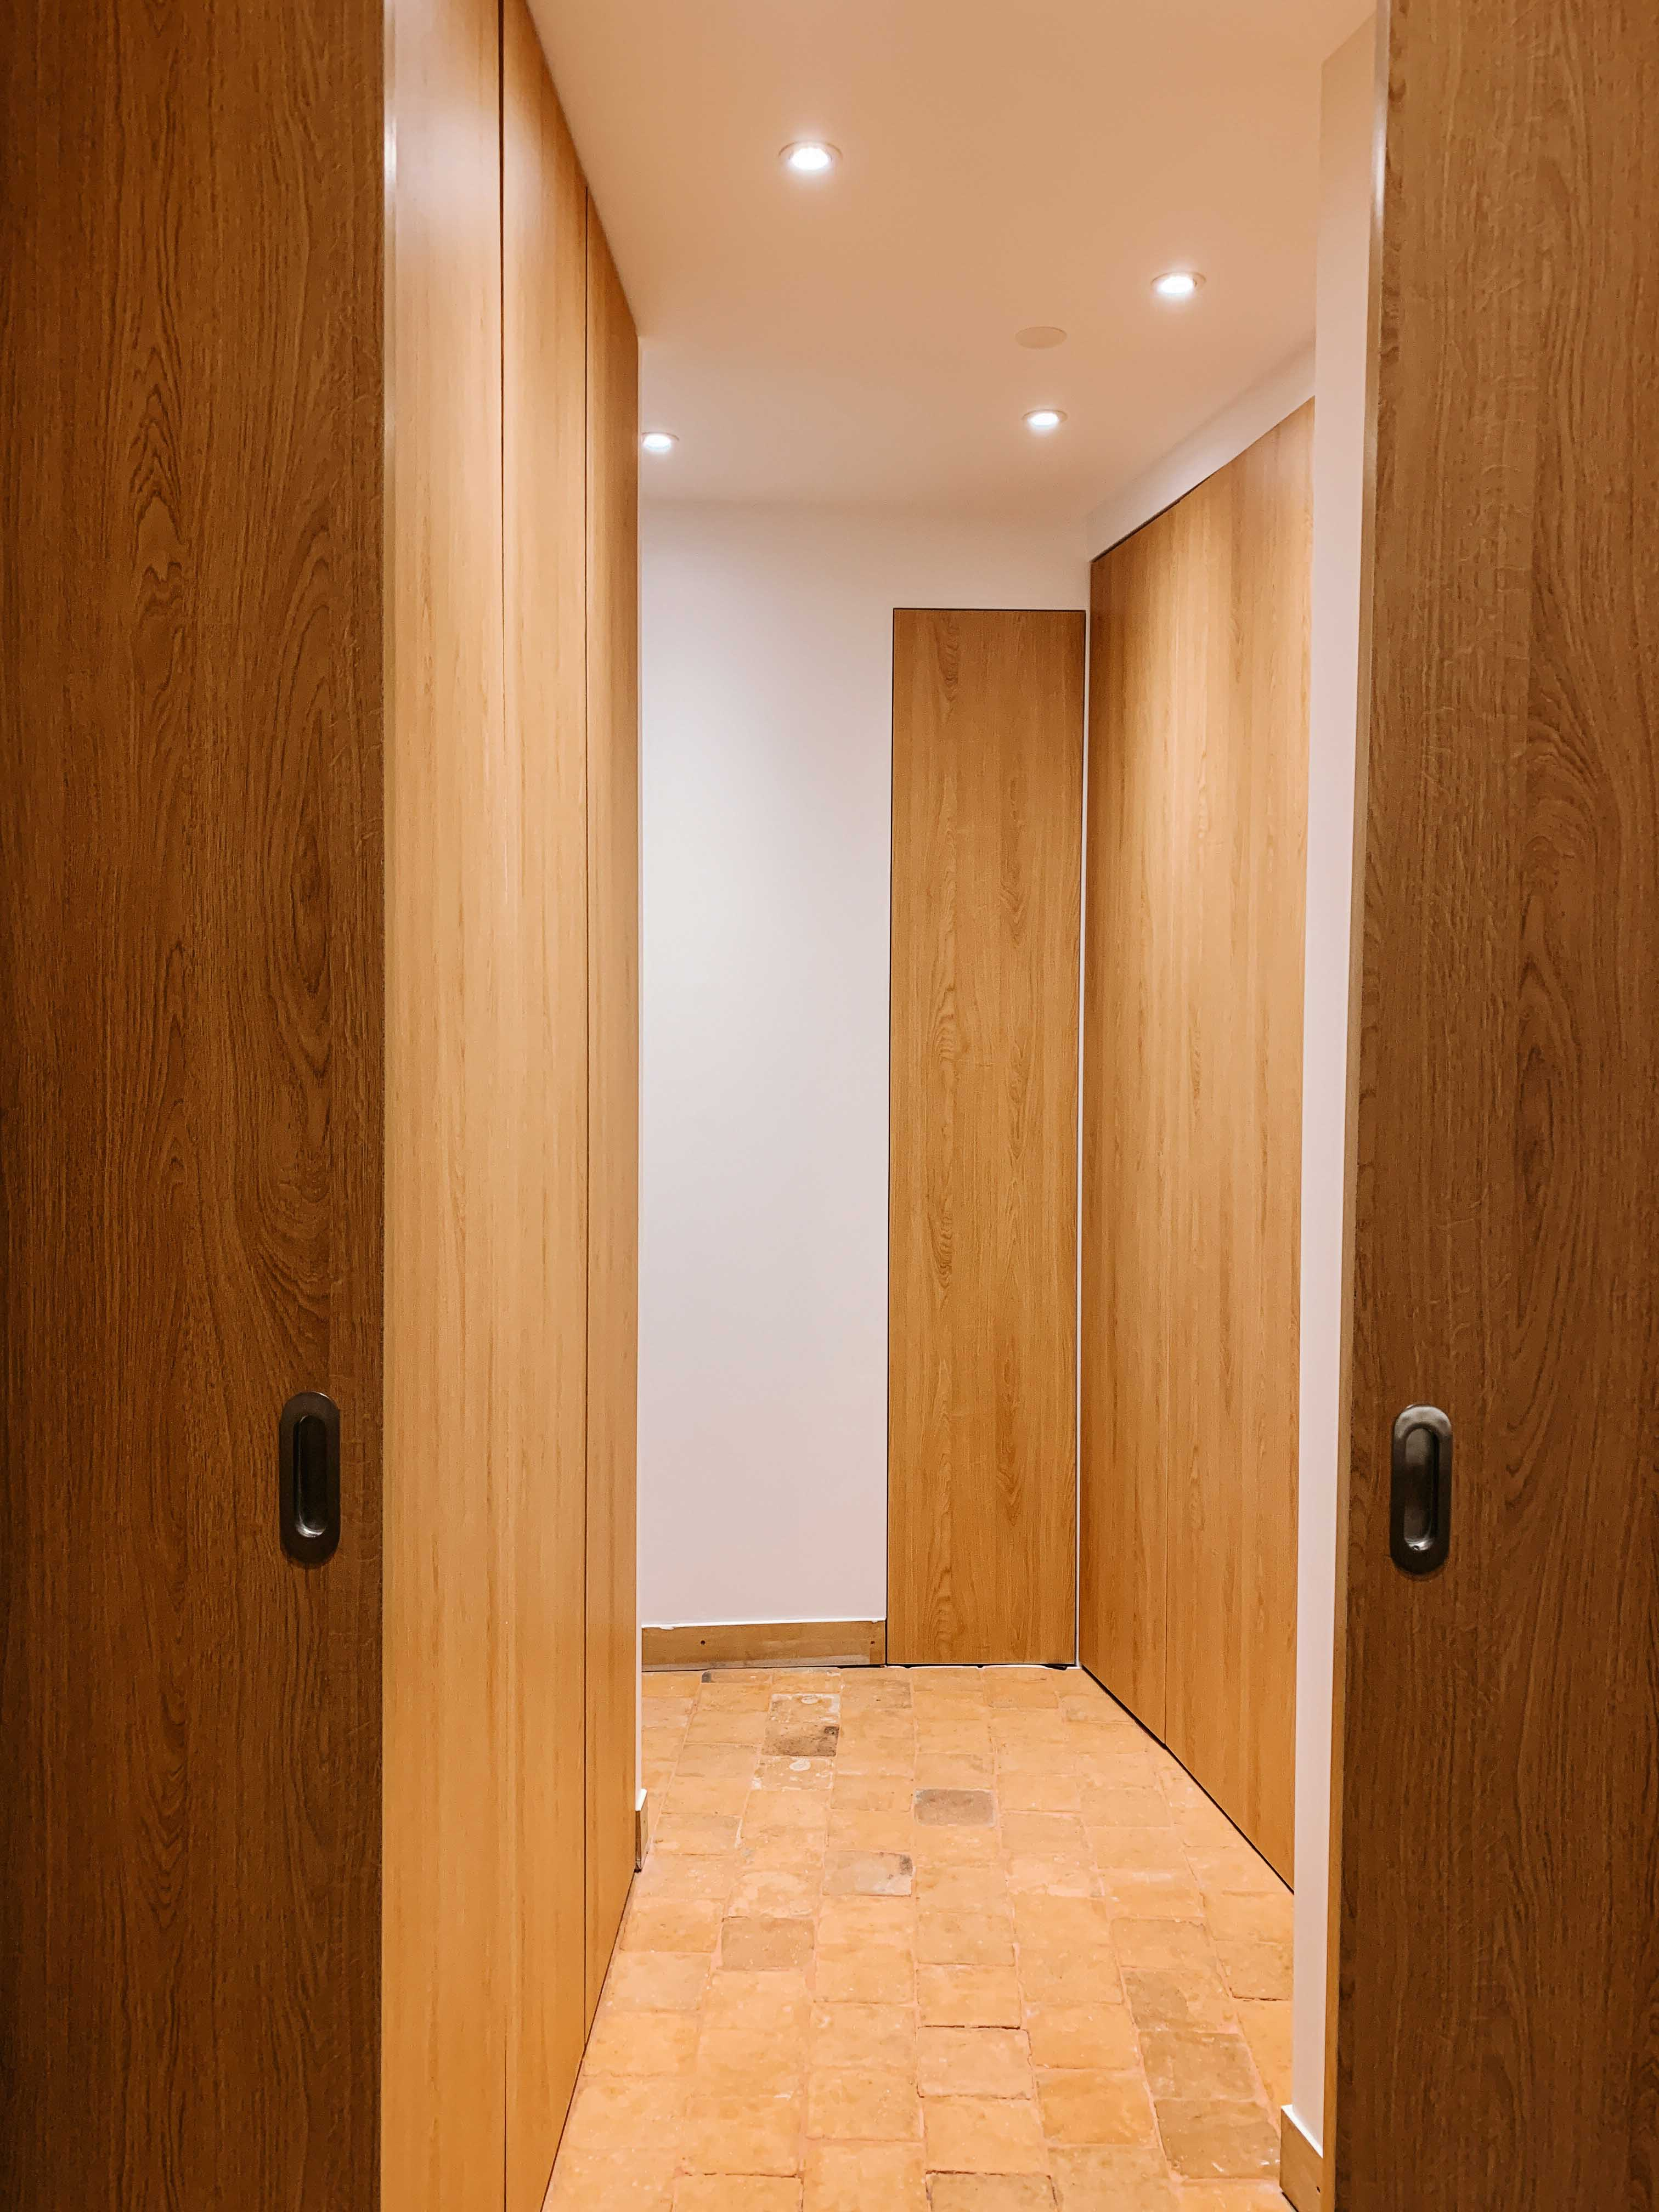 architecte-lyon-rénovation-presbytere-marcilly-azergues-pierre-dorée-29